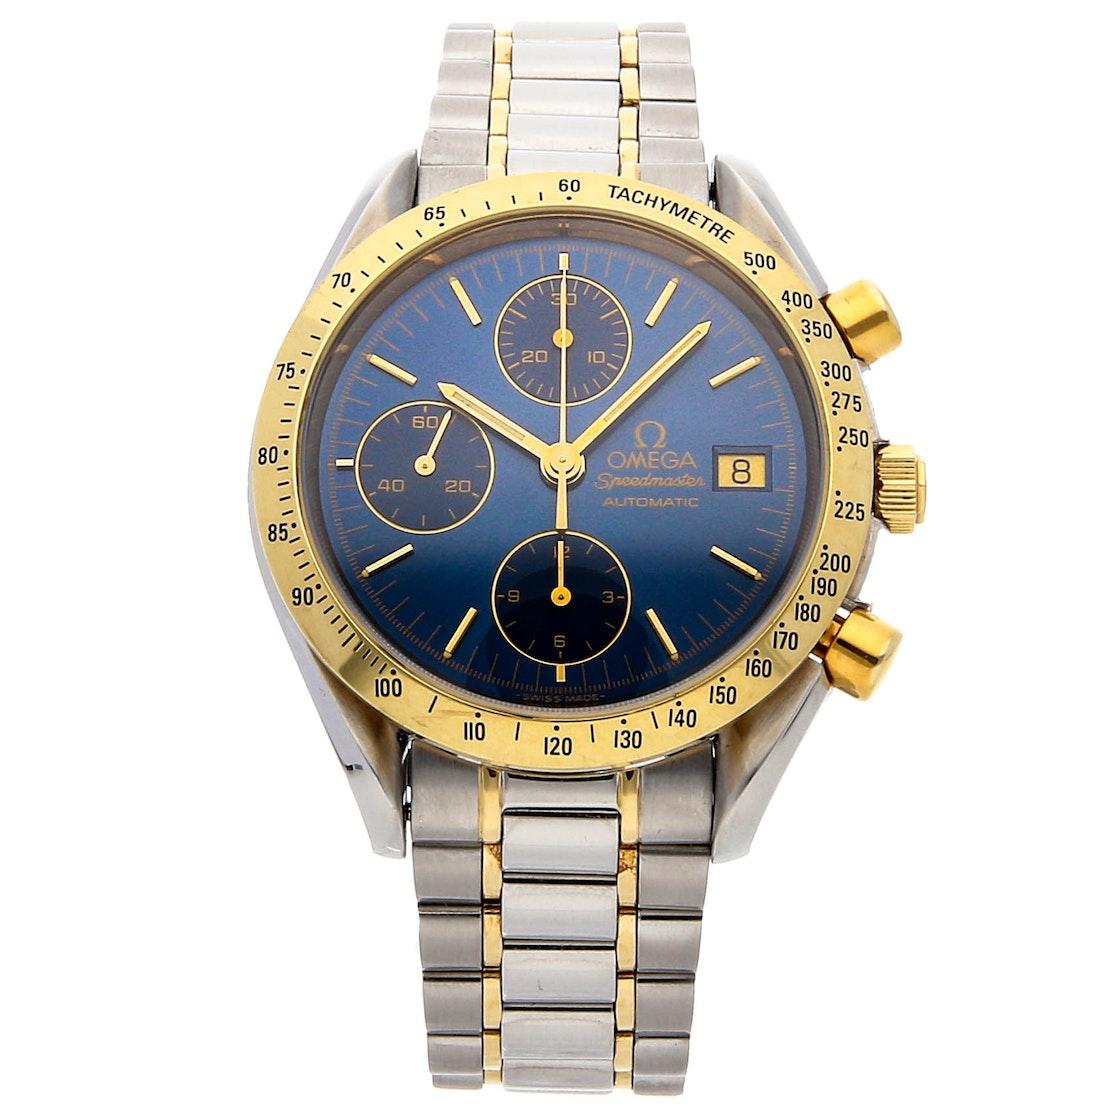 Omega Speedmaster Chronograph 3711